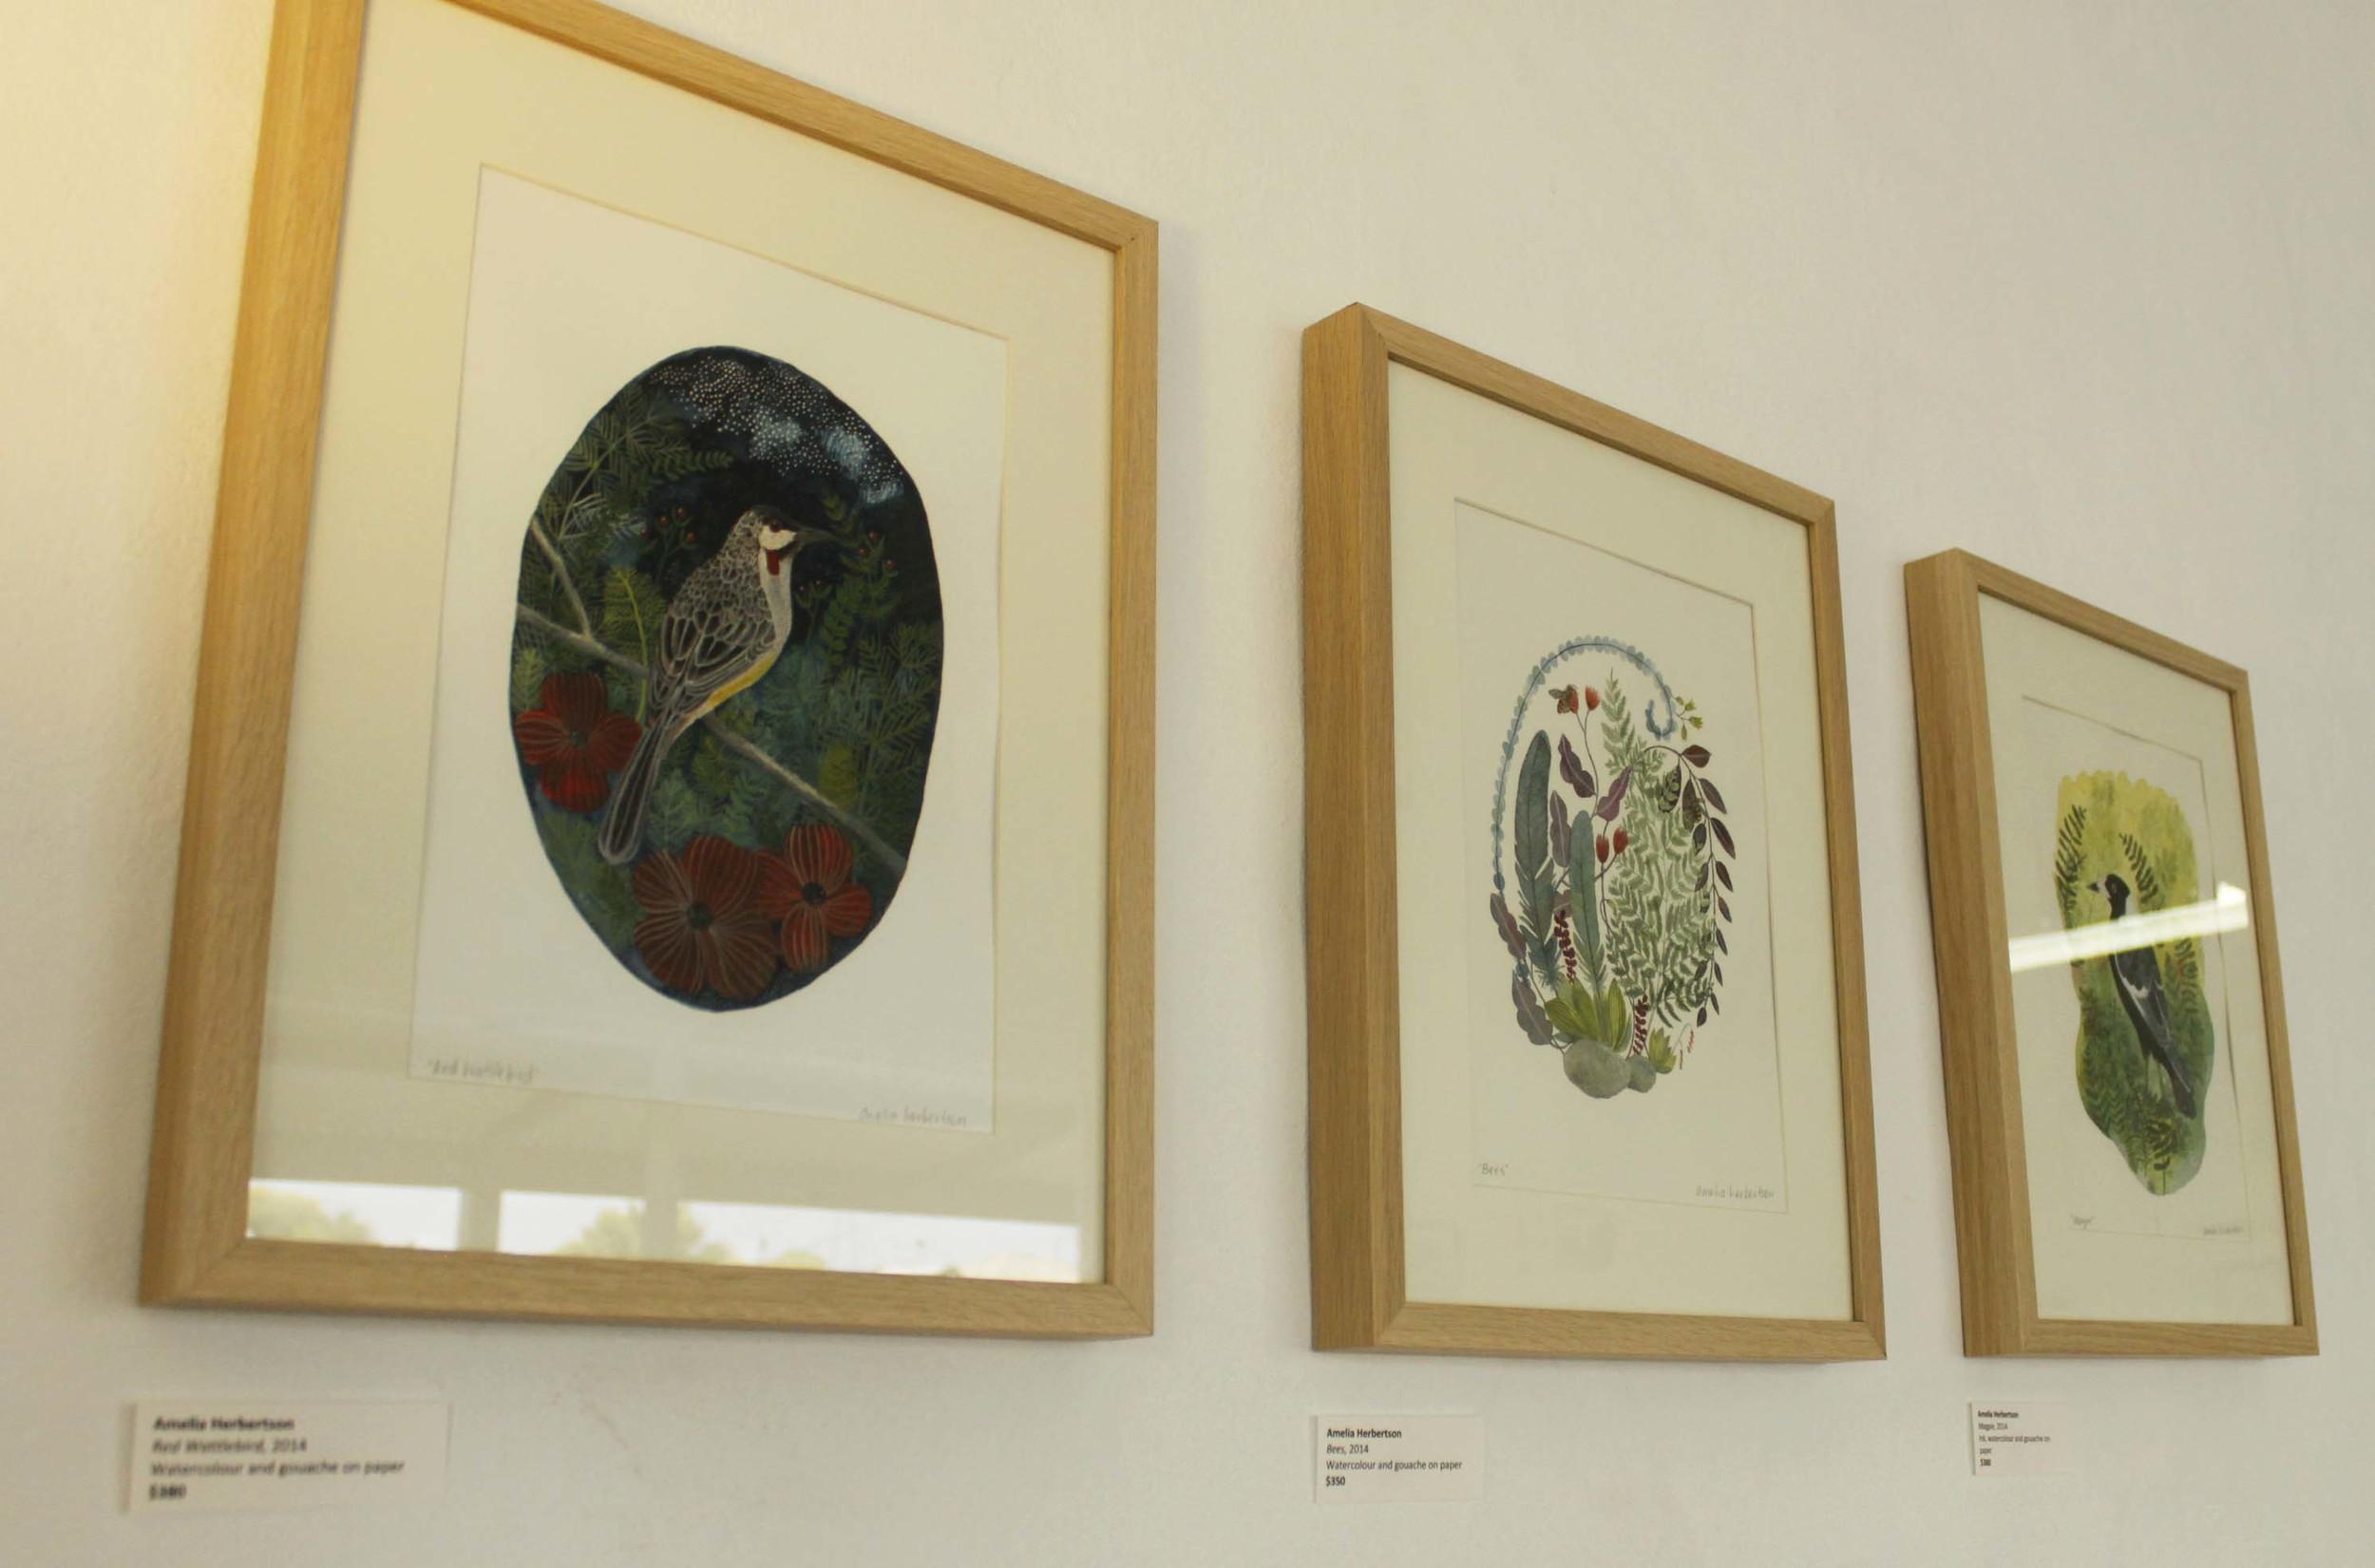 Gouache and watercolour series by Amelia Herbertson